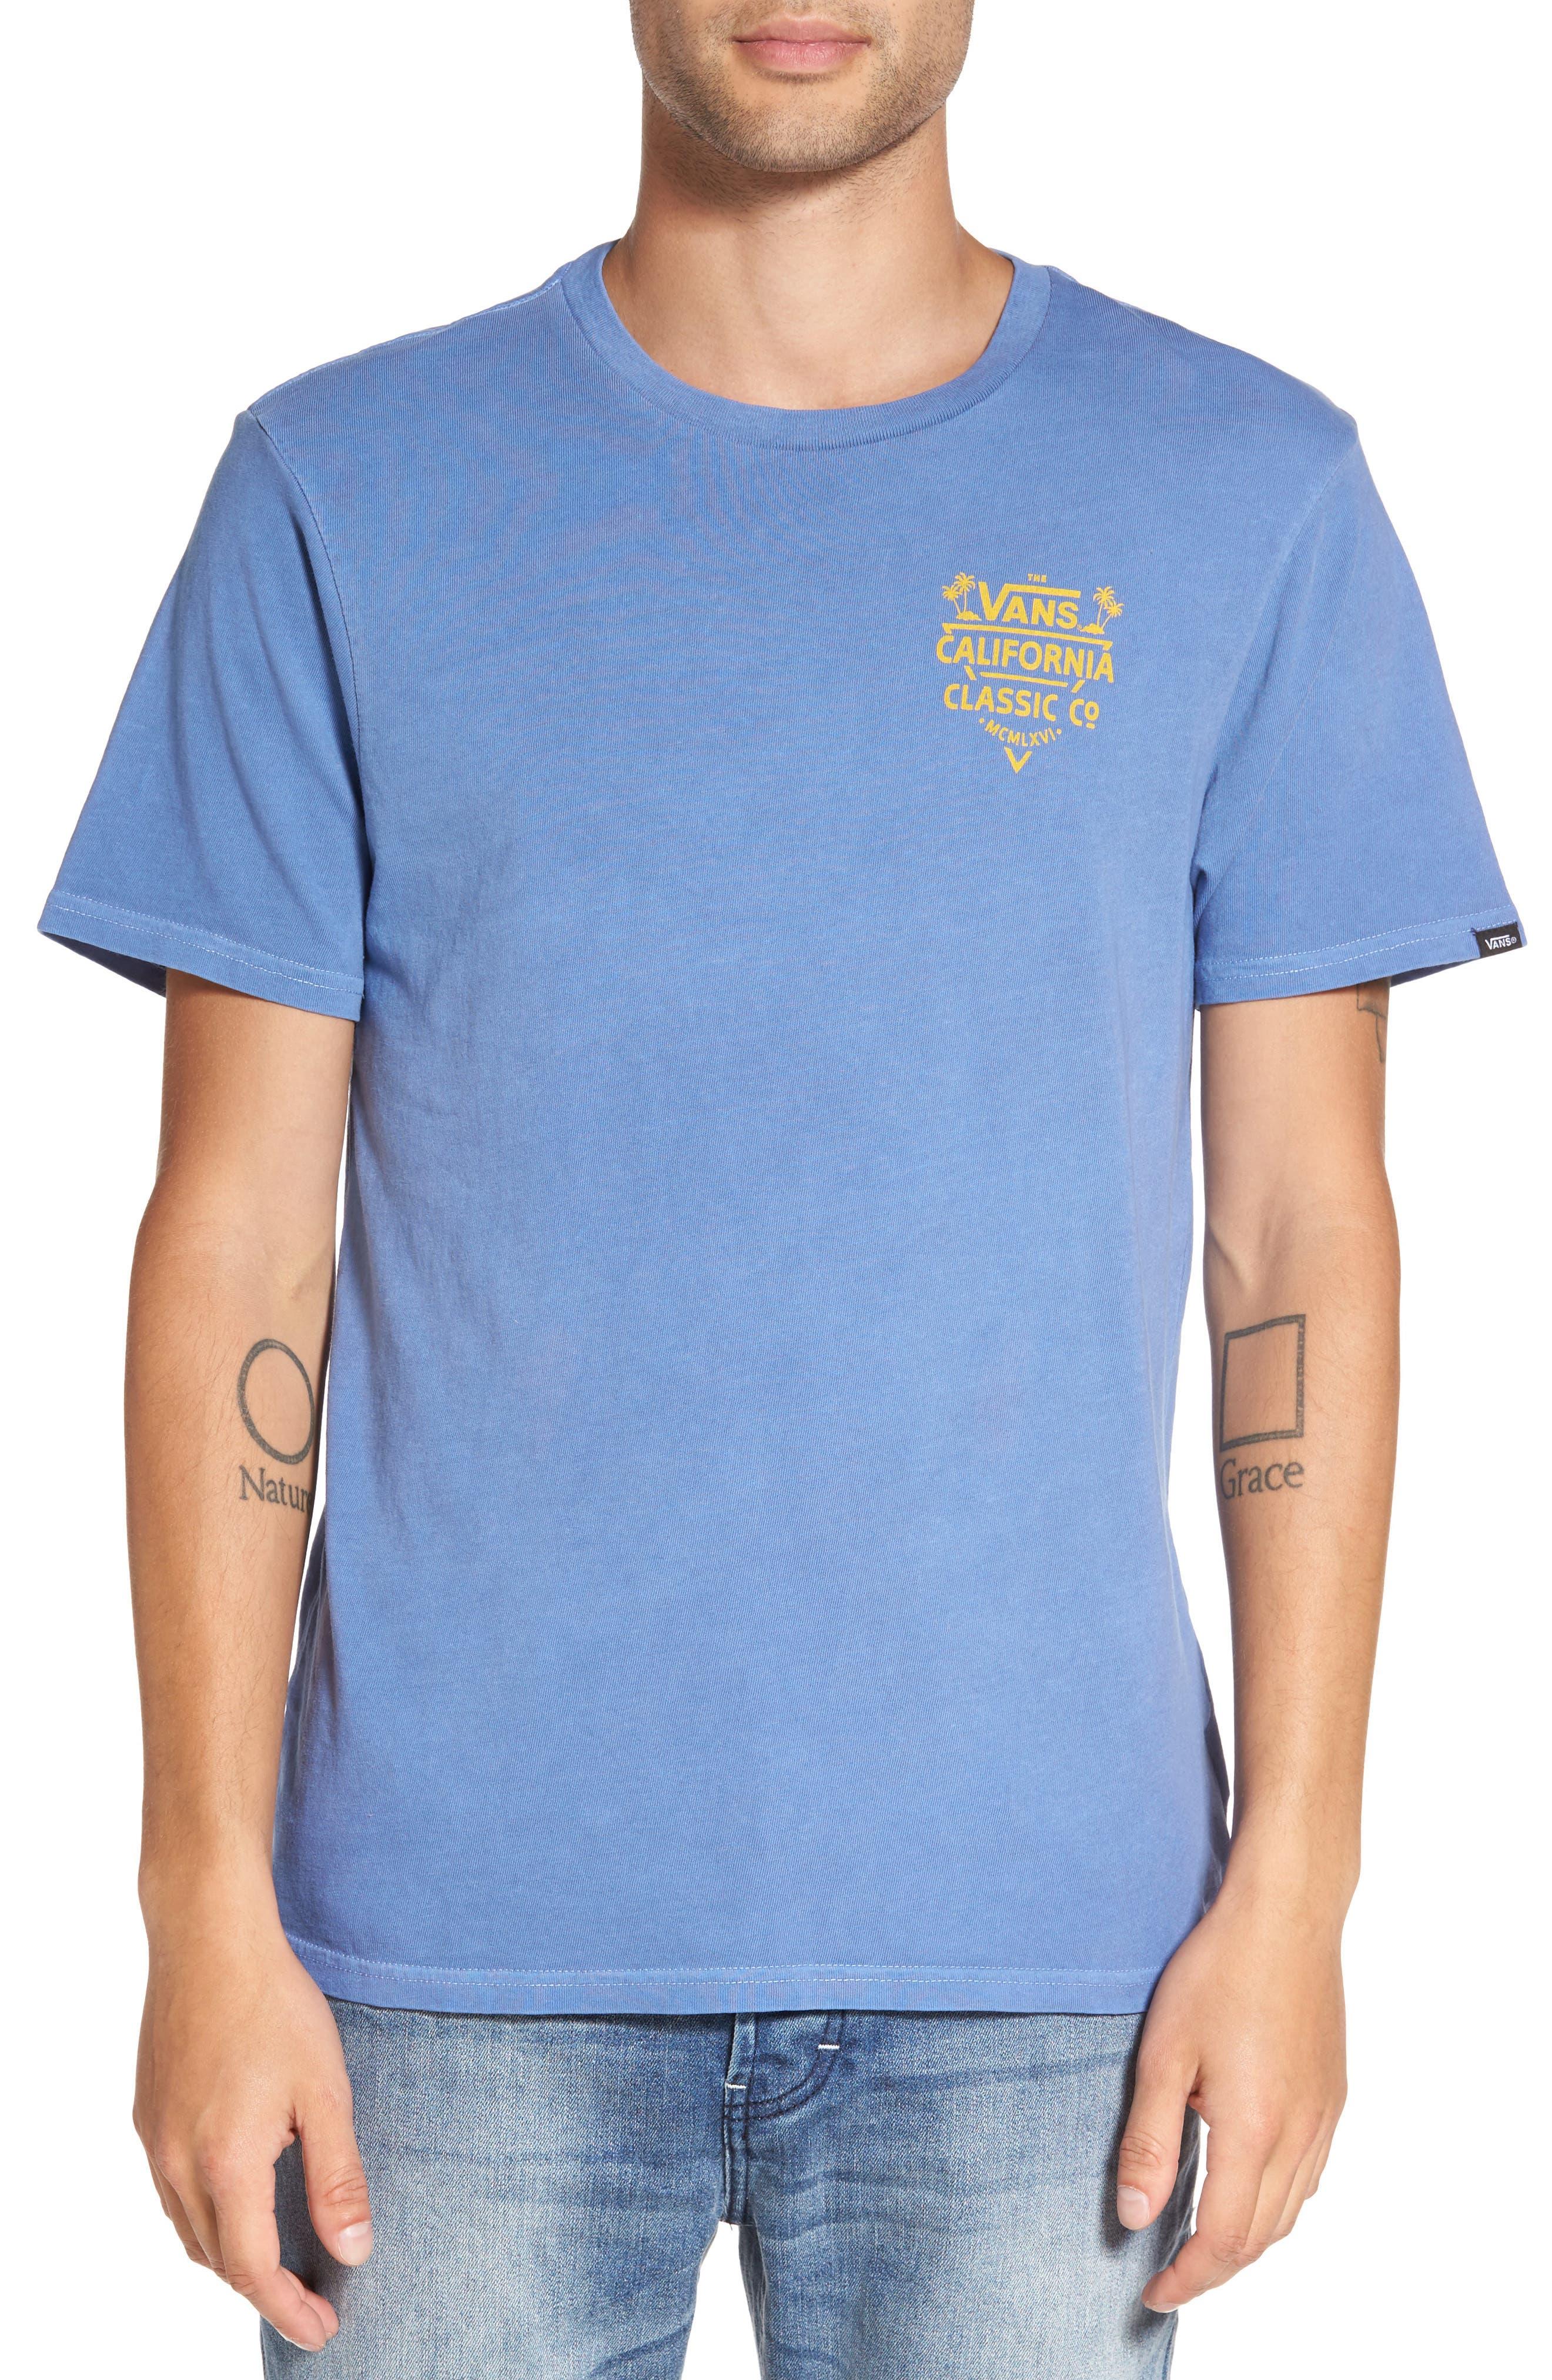 Alternate Image 1 Selected - Vans California Classic Co. Overdye T-Shirt